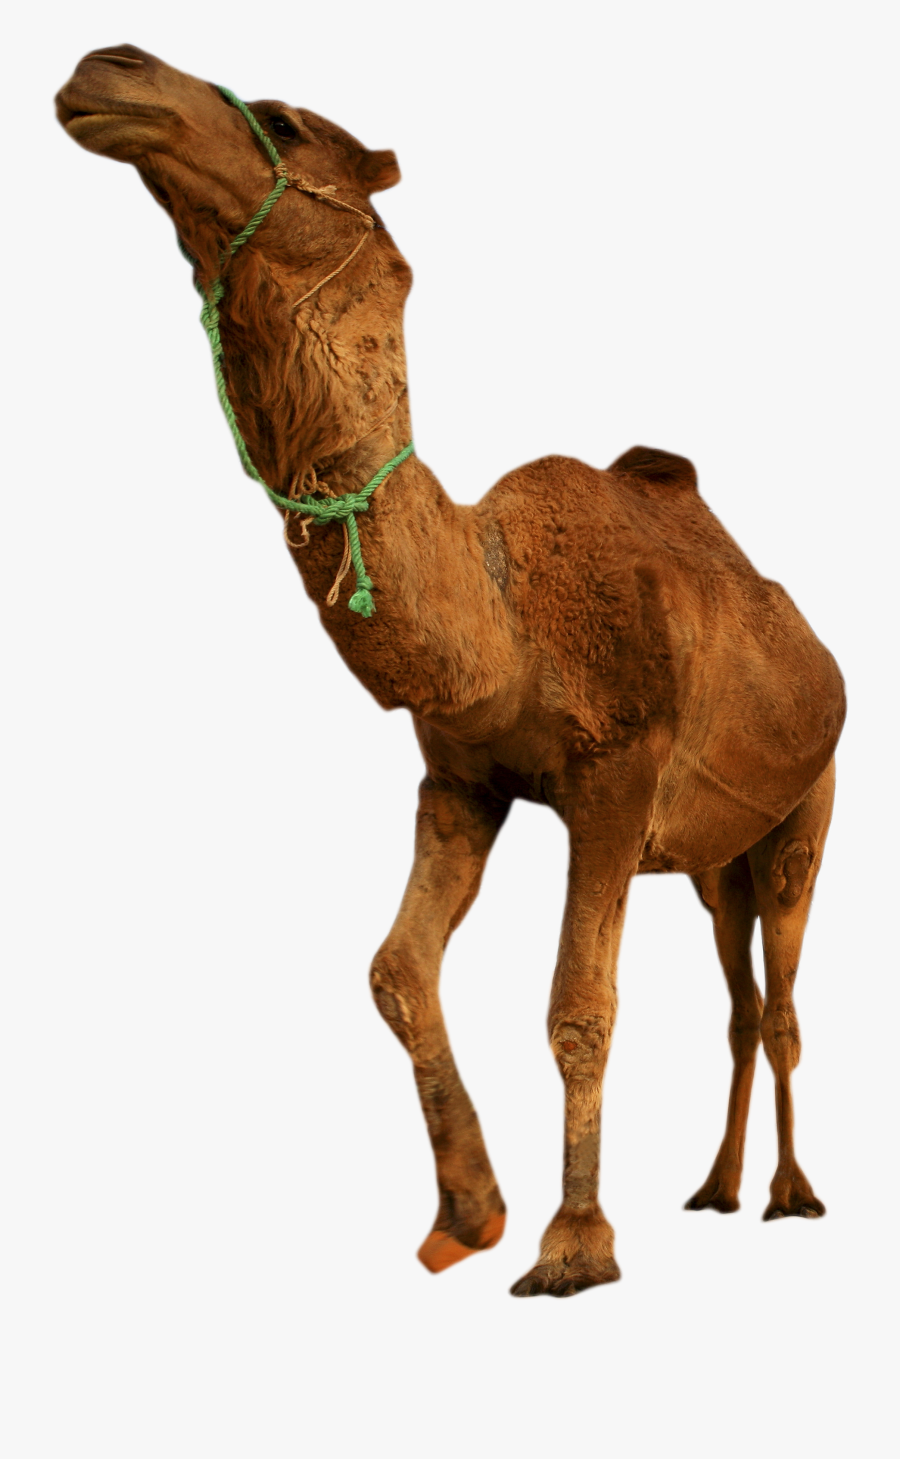 Clip Art Camel In Desert Picture - Desert Animal Png Background, Transparent Clipart